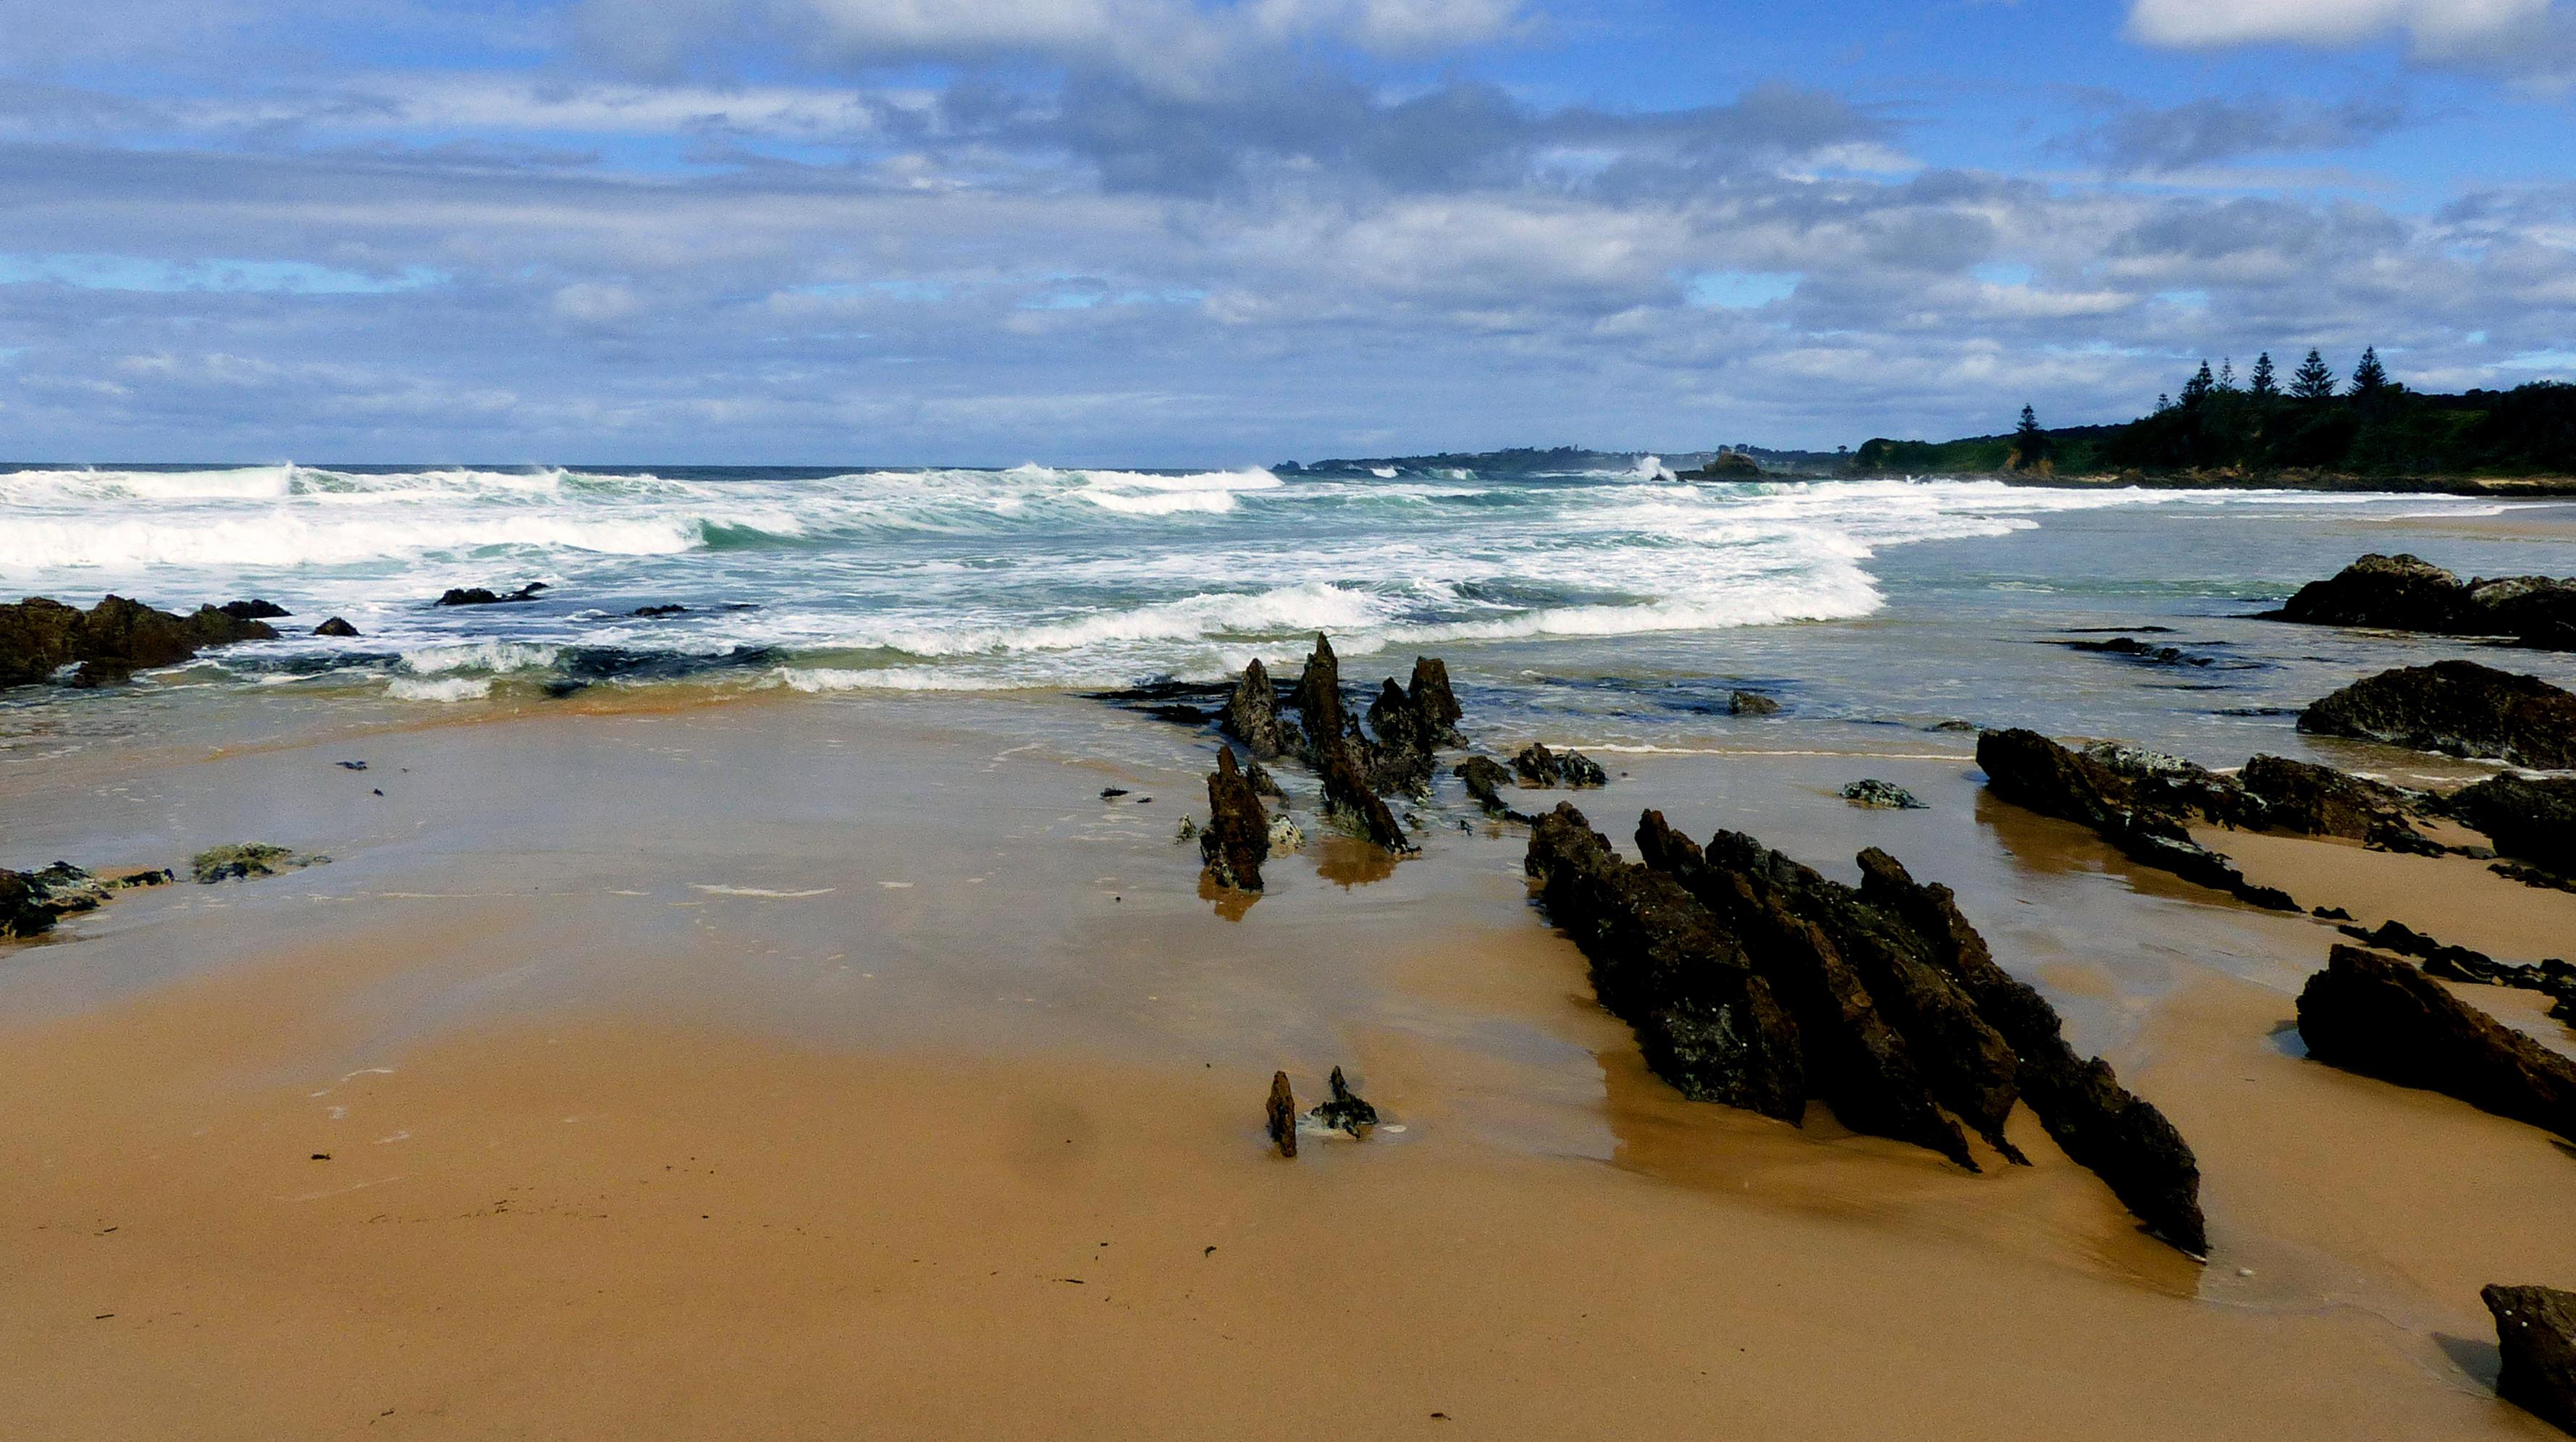 Yabbarra beach nsw.aust. photo